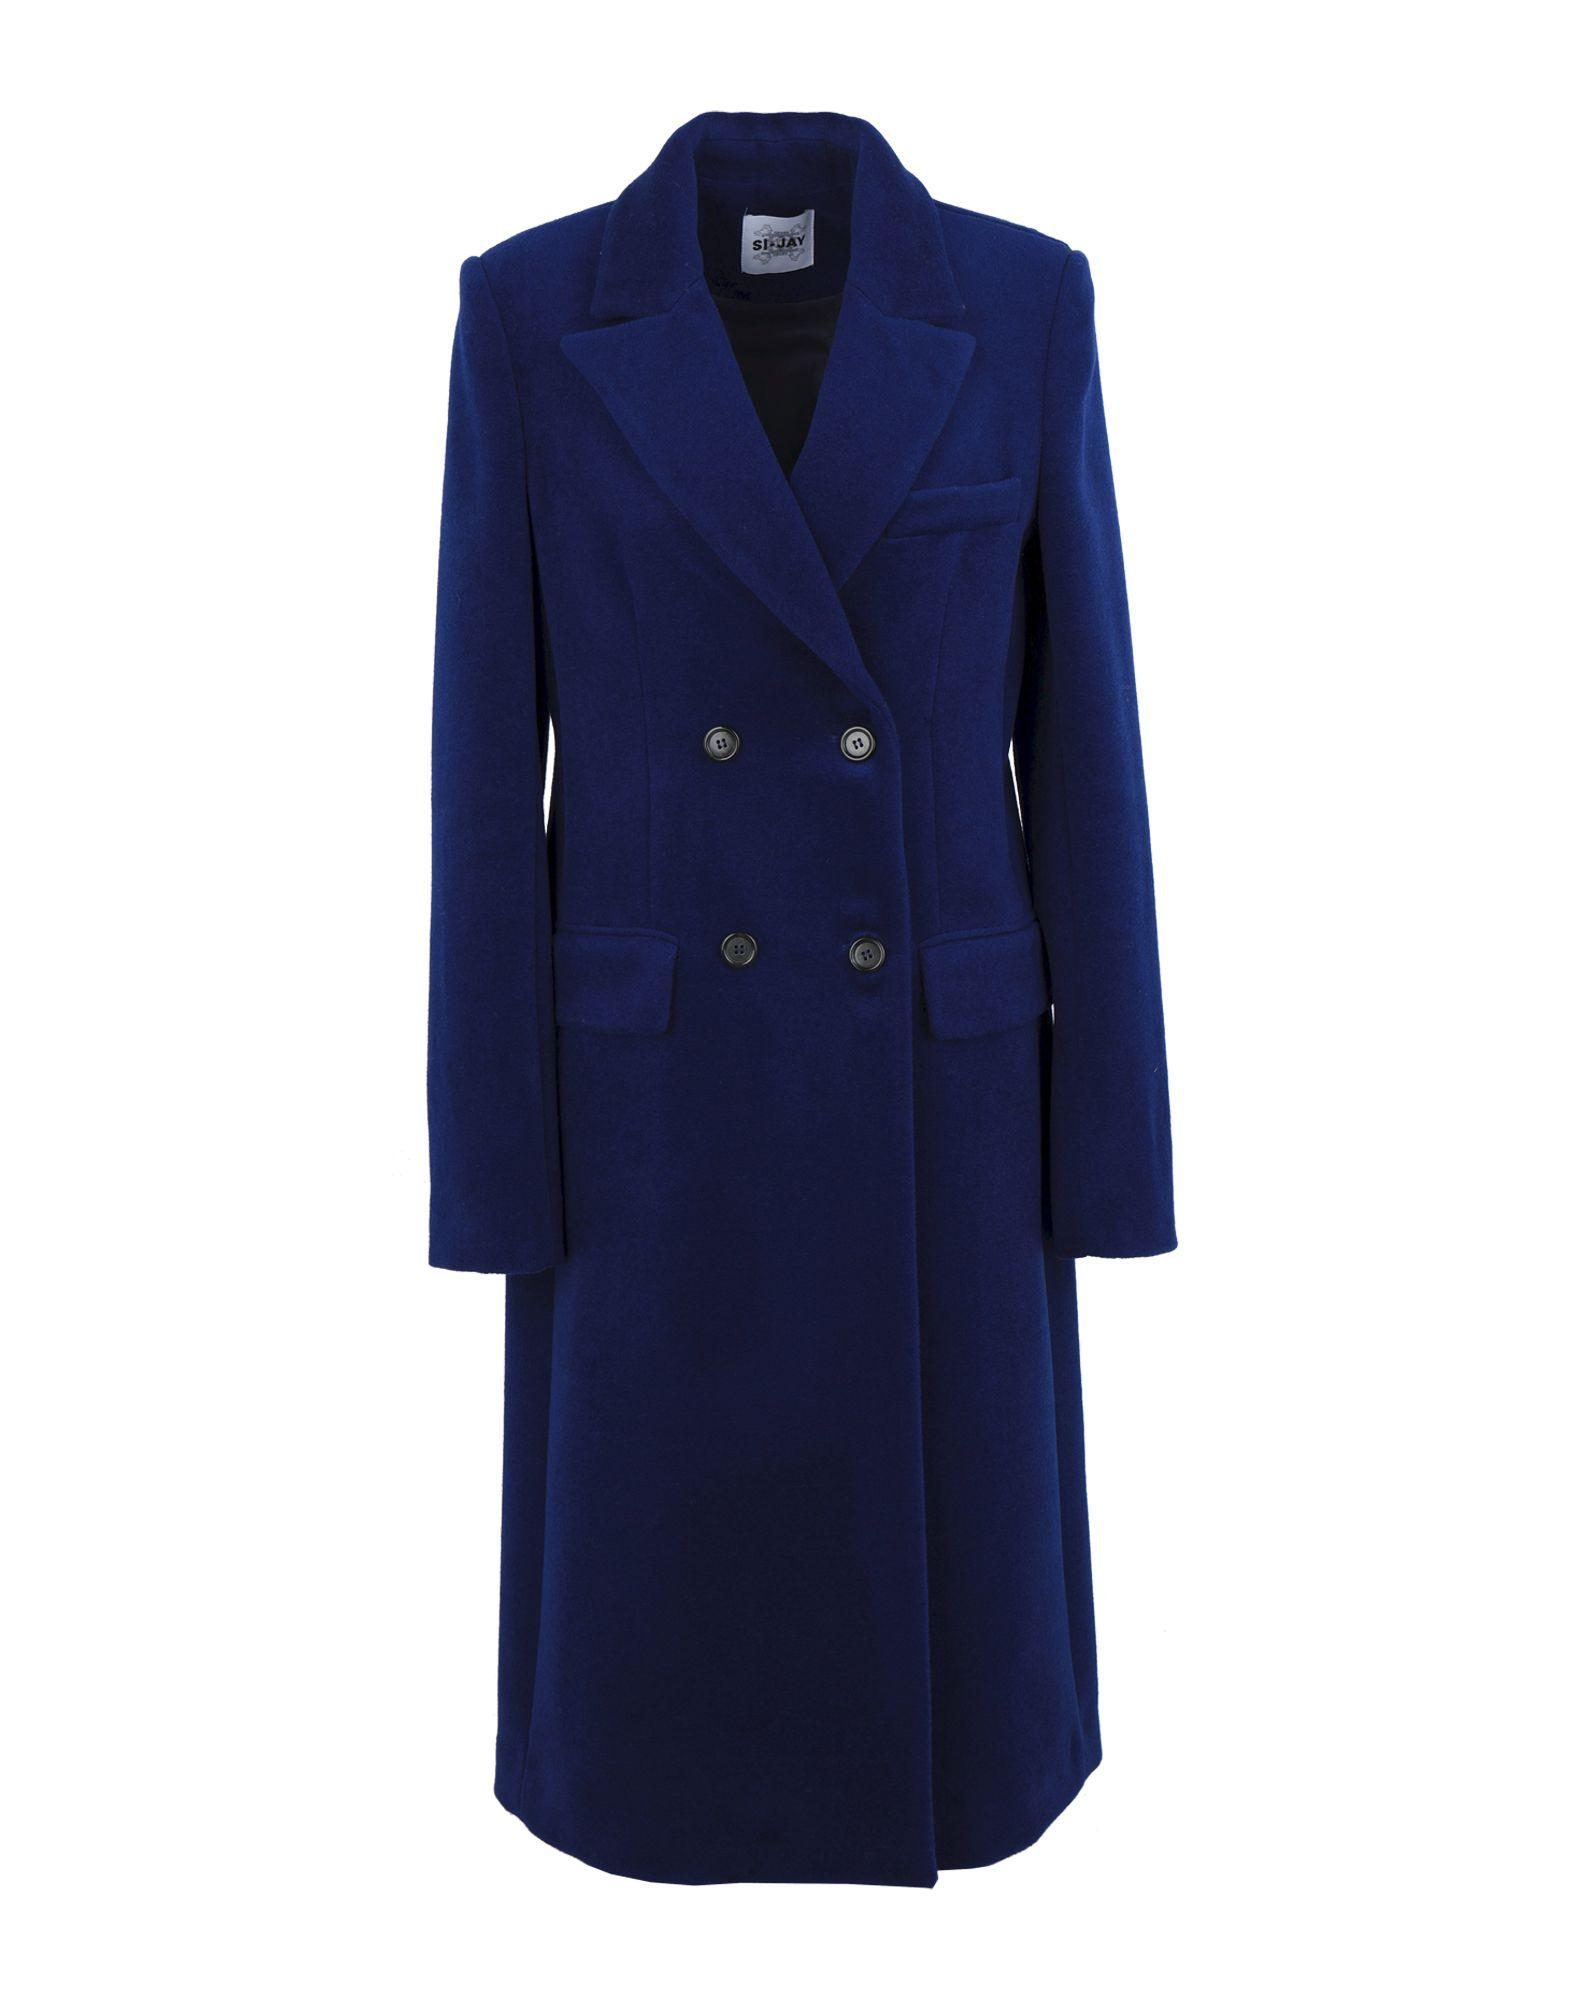 Jay Coats Si States Online Yoox On Coat United Women wiulOZPkXT